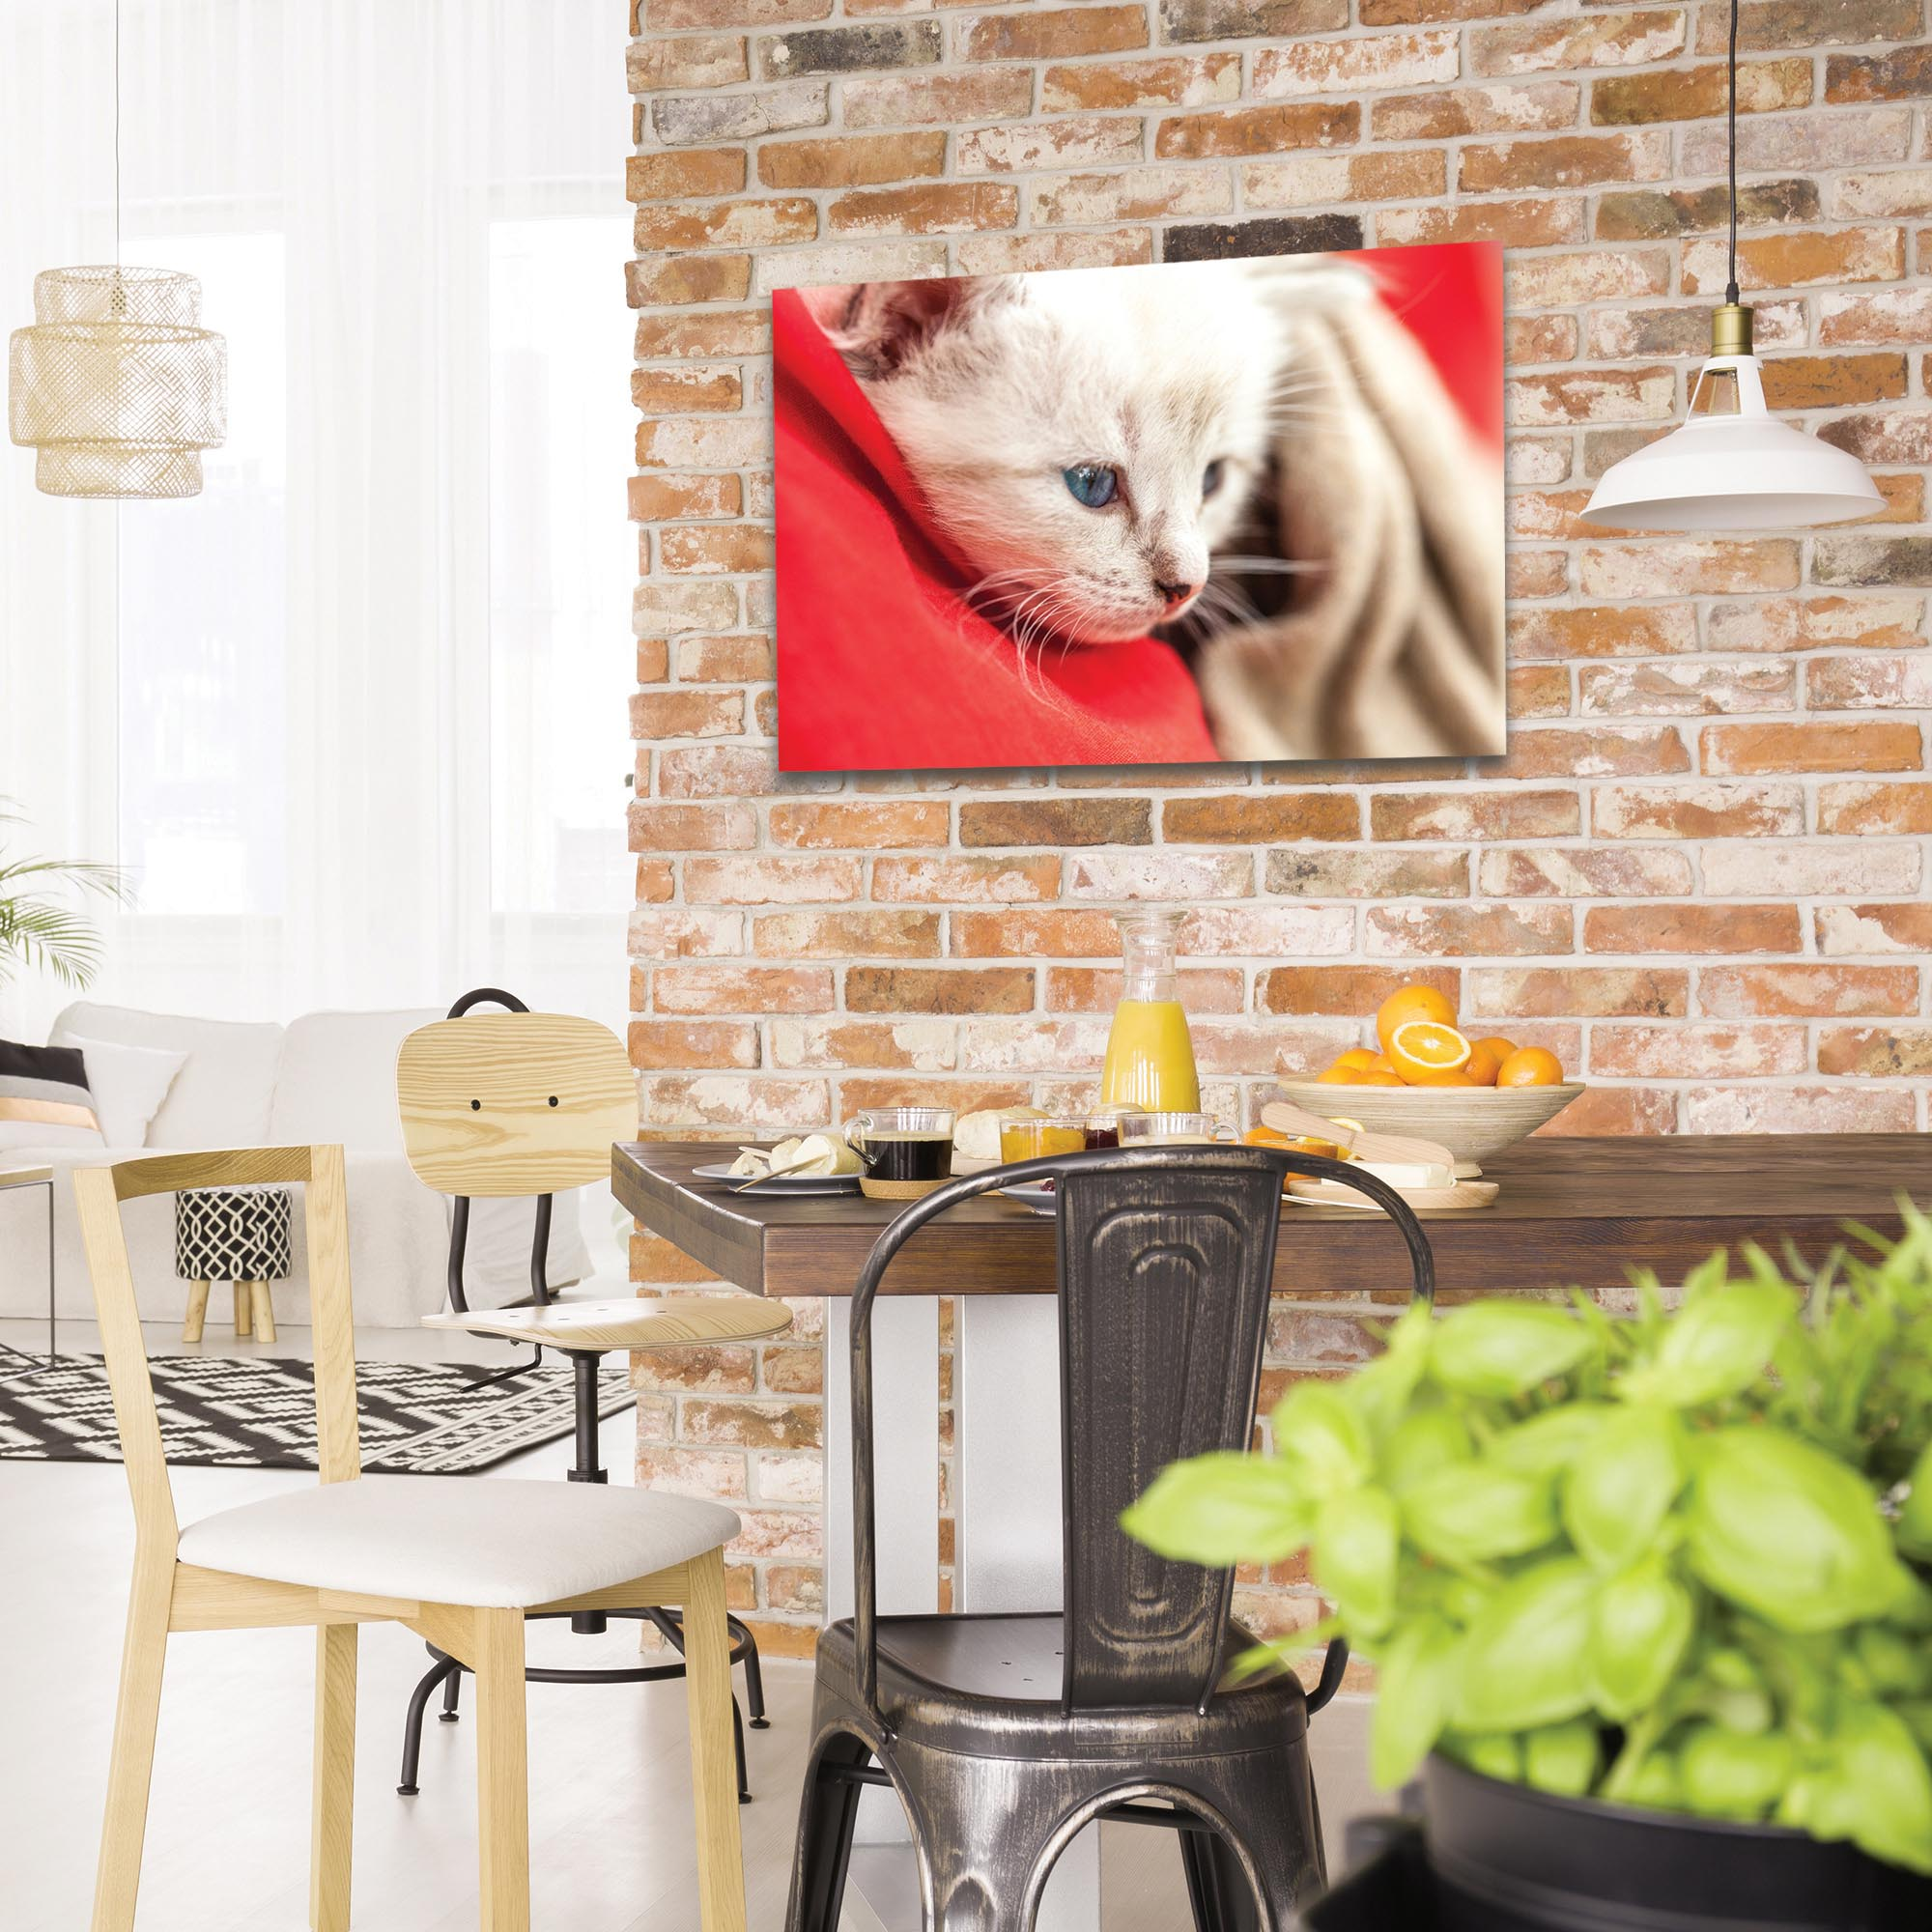 Casual Wall Art 'Bundled Kitten' - Wildlife Decor on Metal or Plexiglass - Lifestyle View